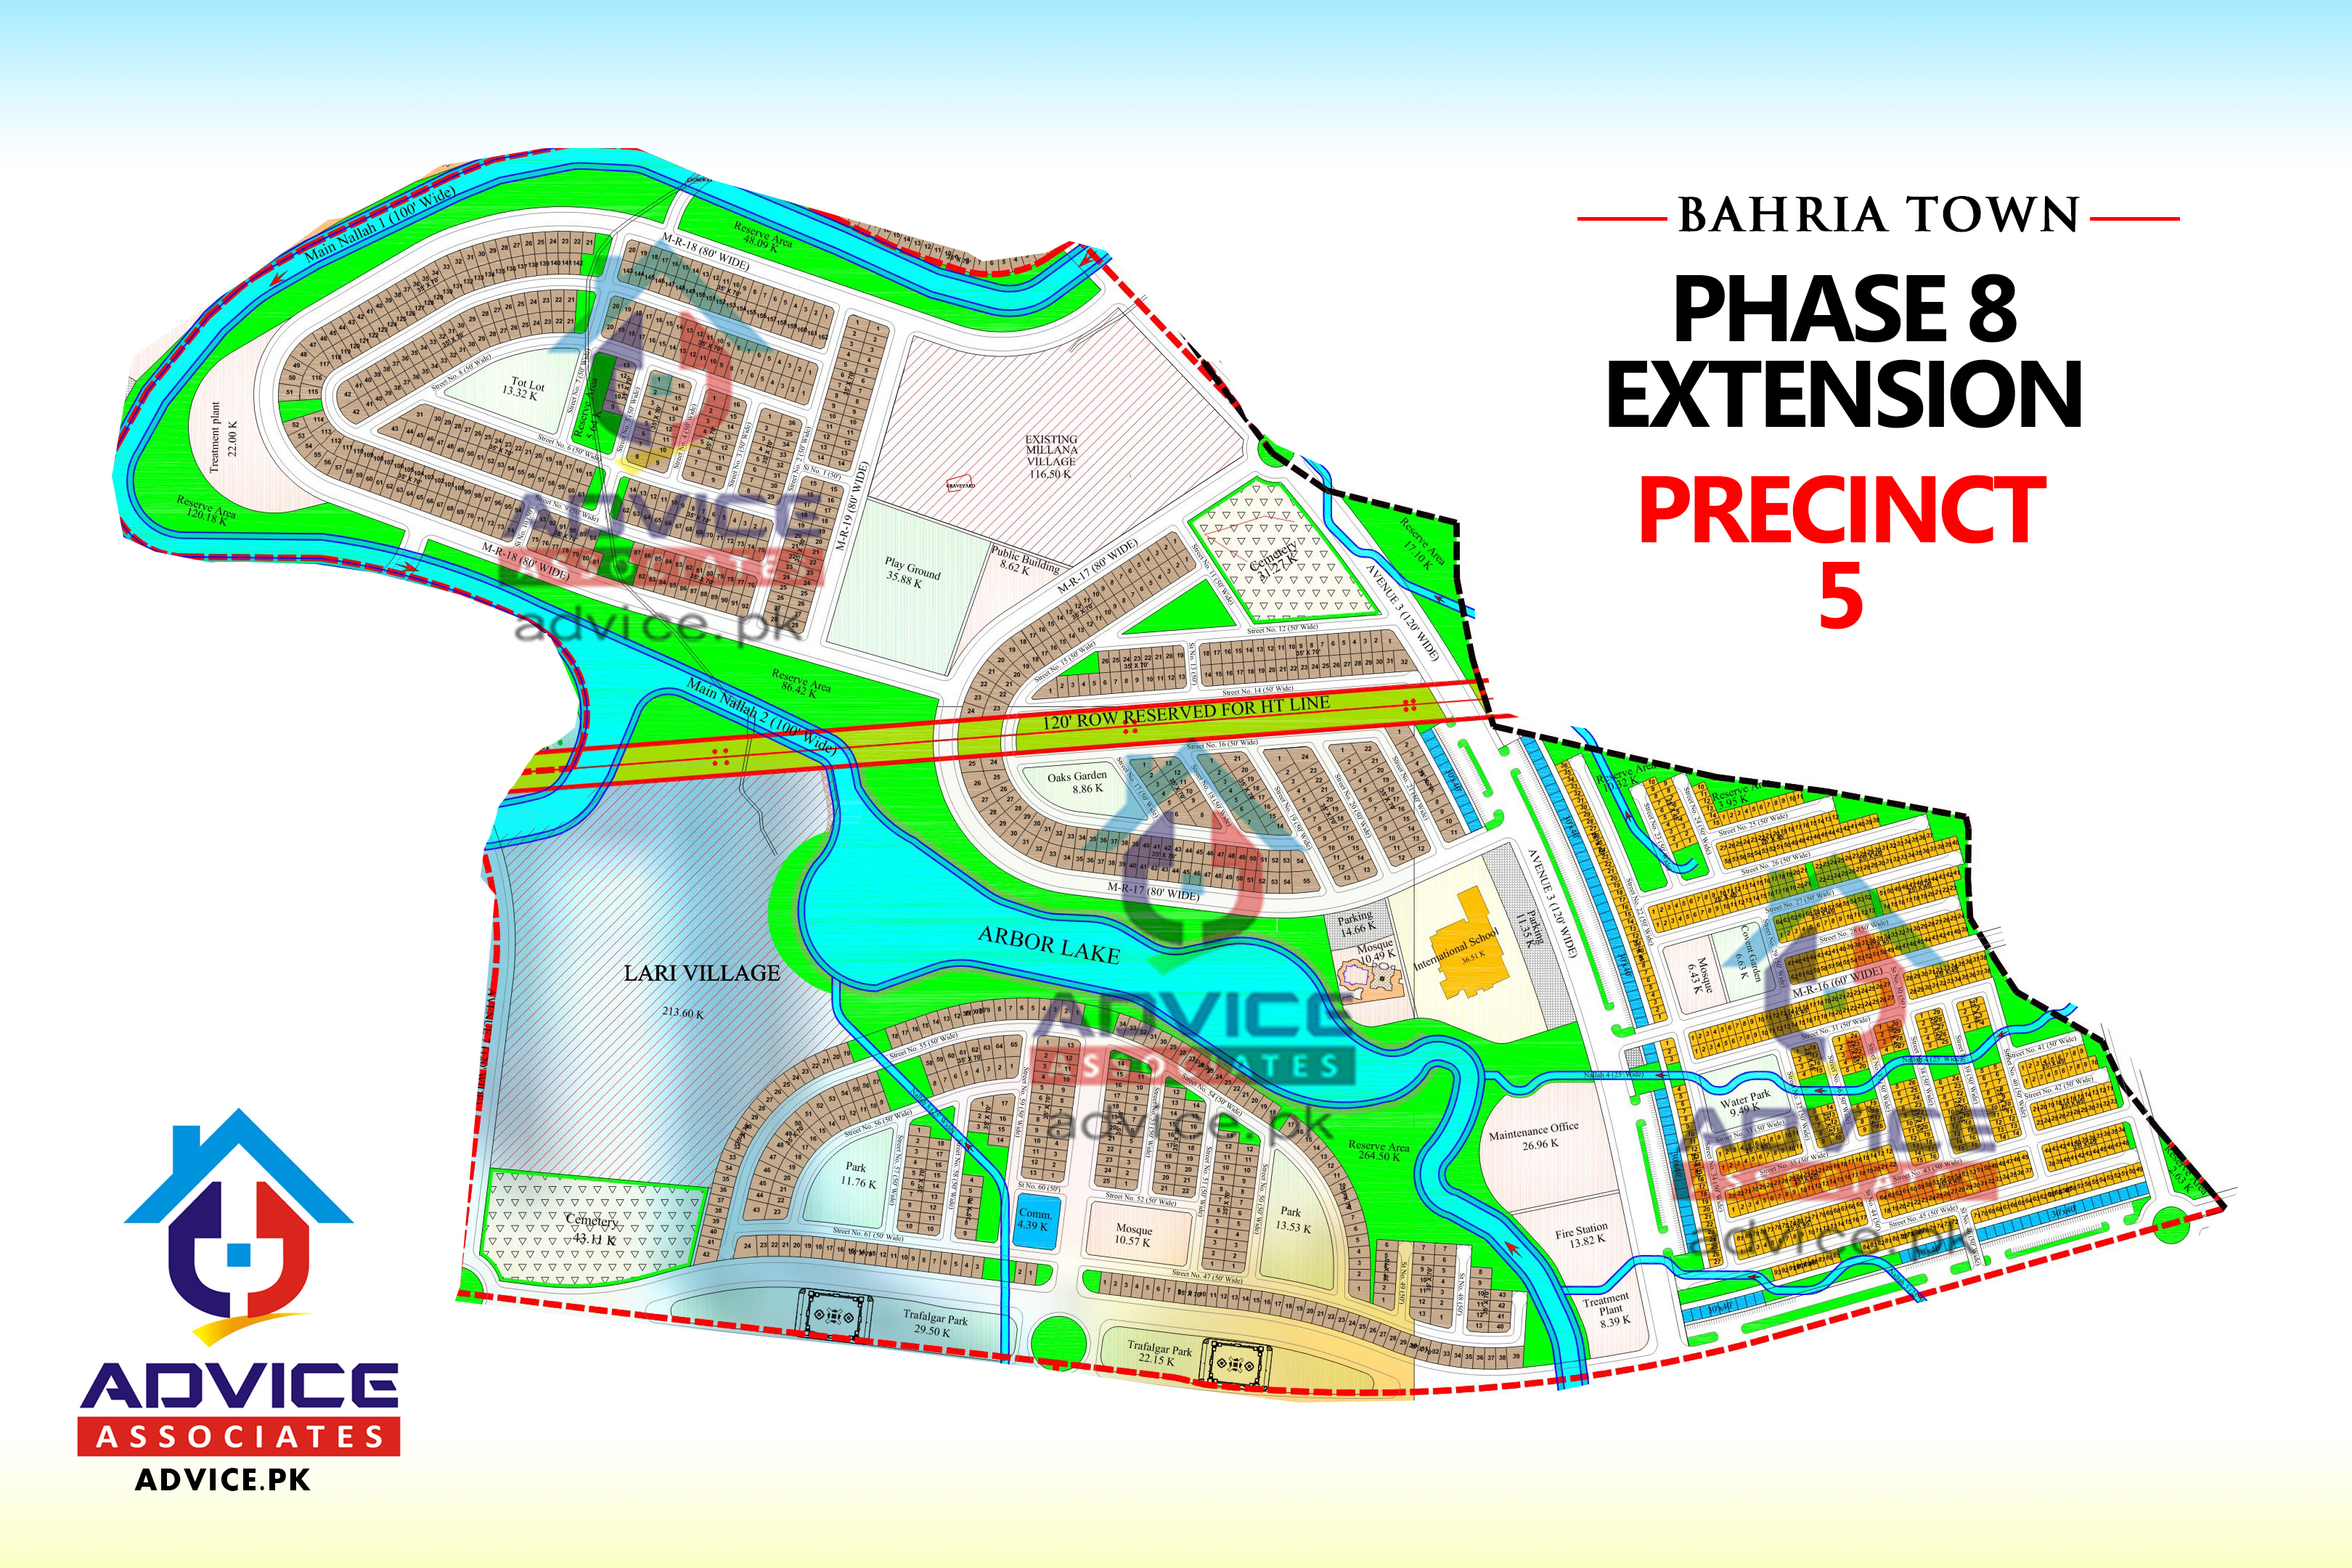 Bahria Town Phase 8 Ext Precinct 5